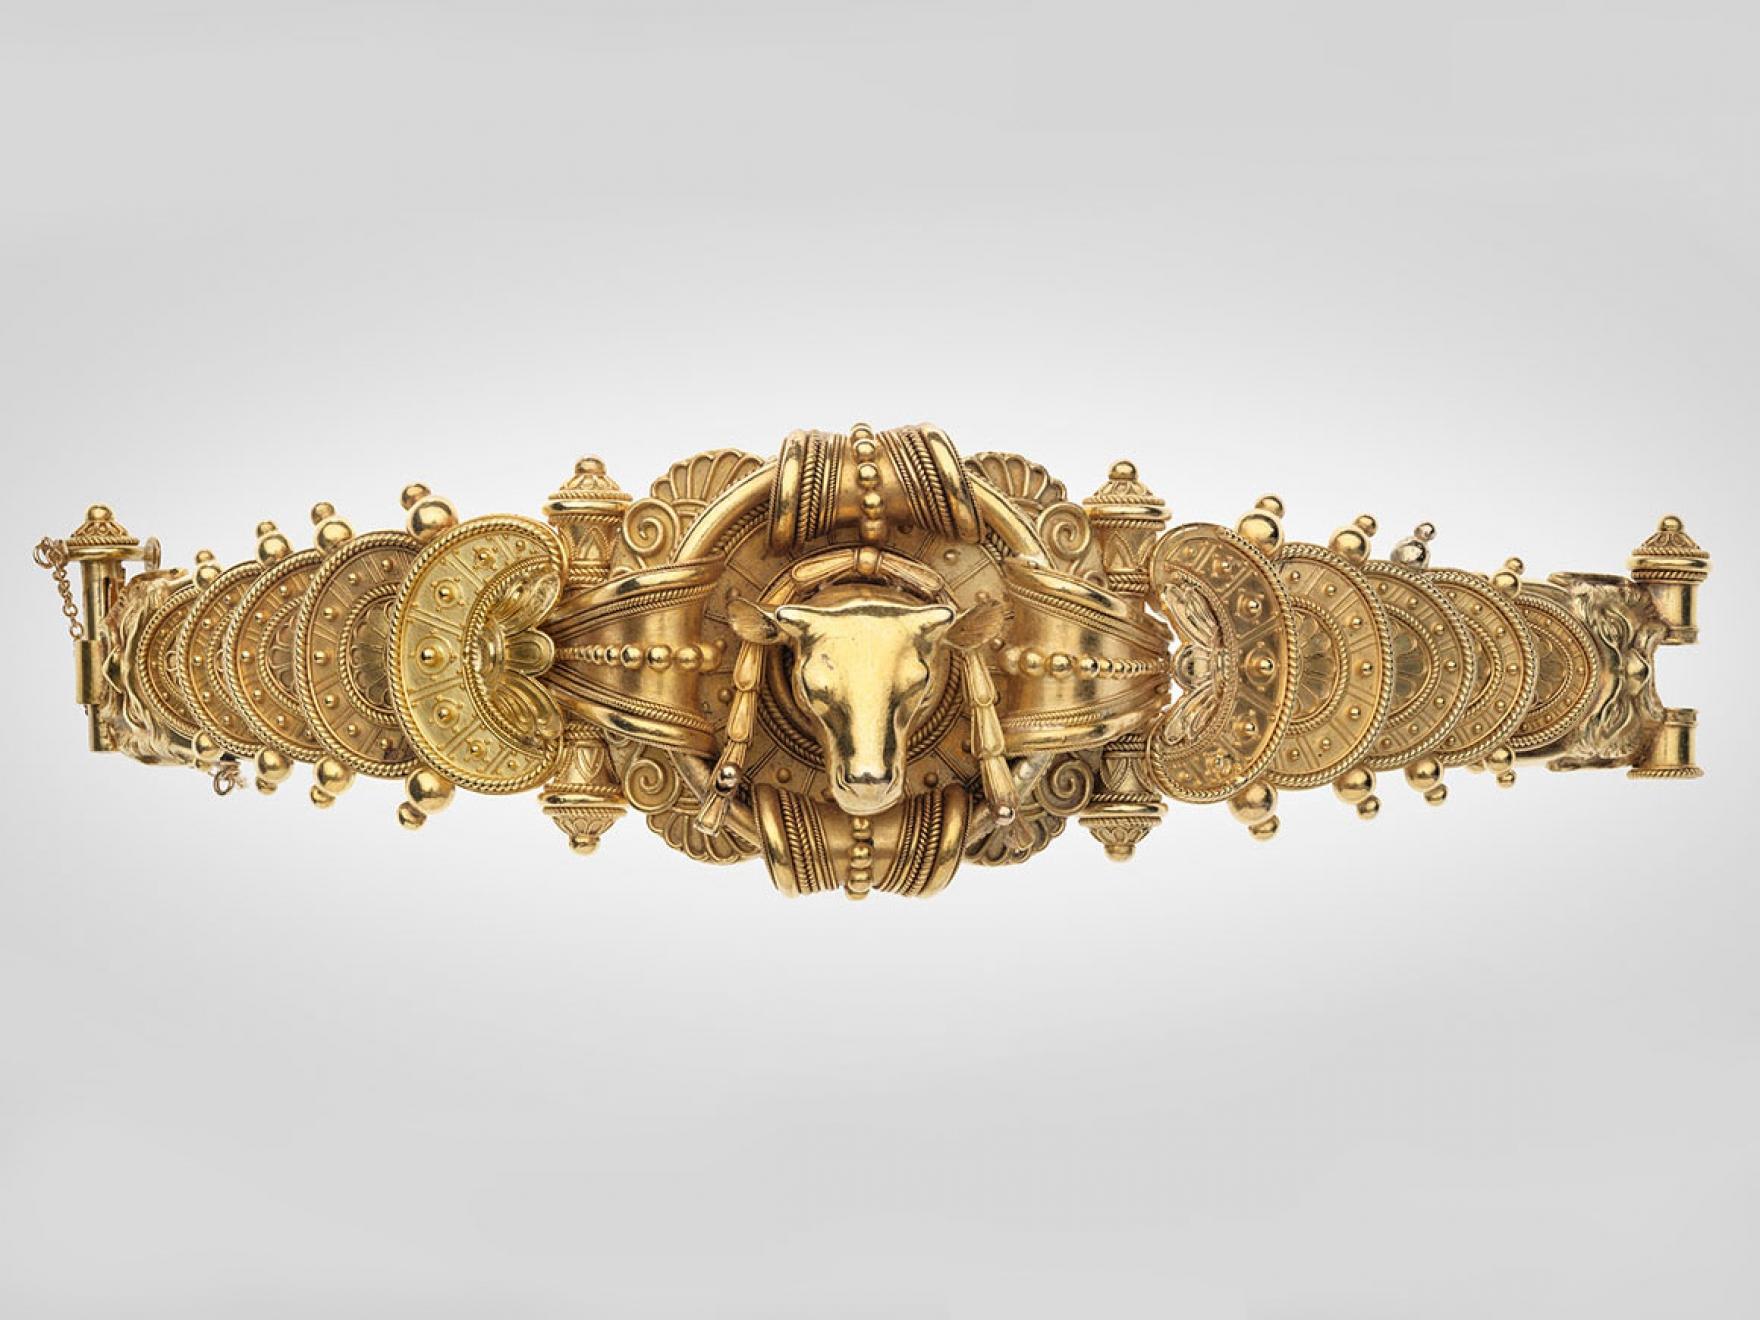 Etruscan Revival Bracelet